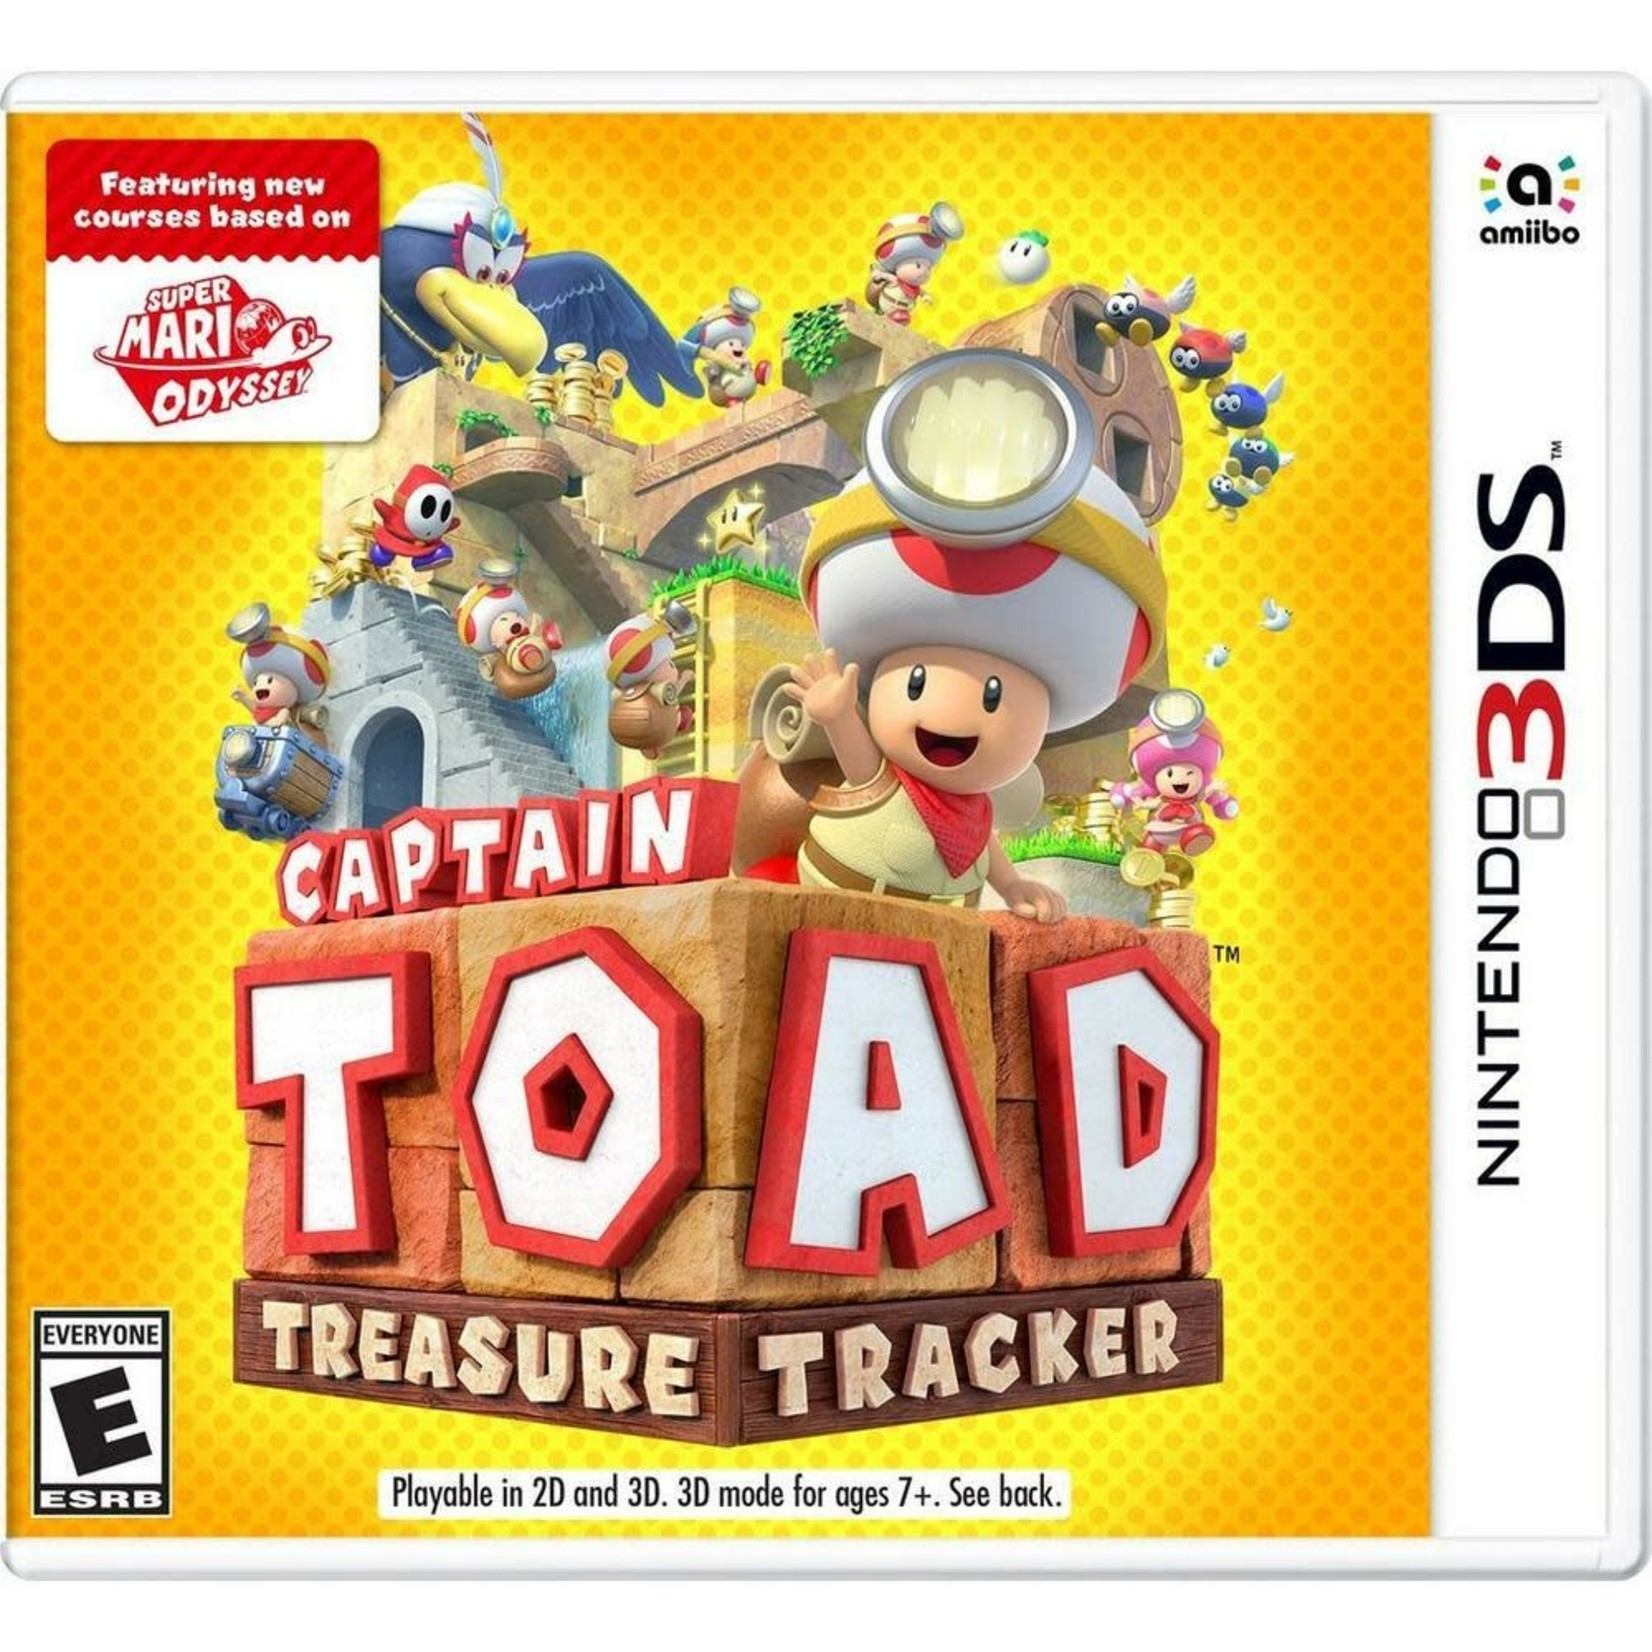 3DS-Captain Toad: Treasure Tracker